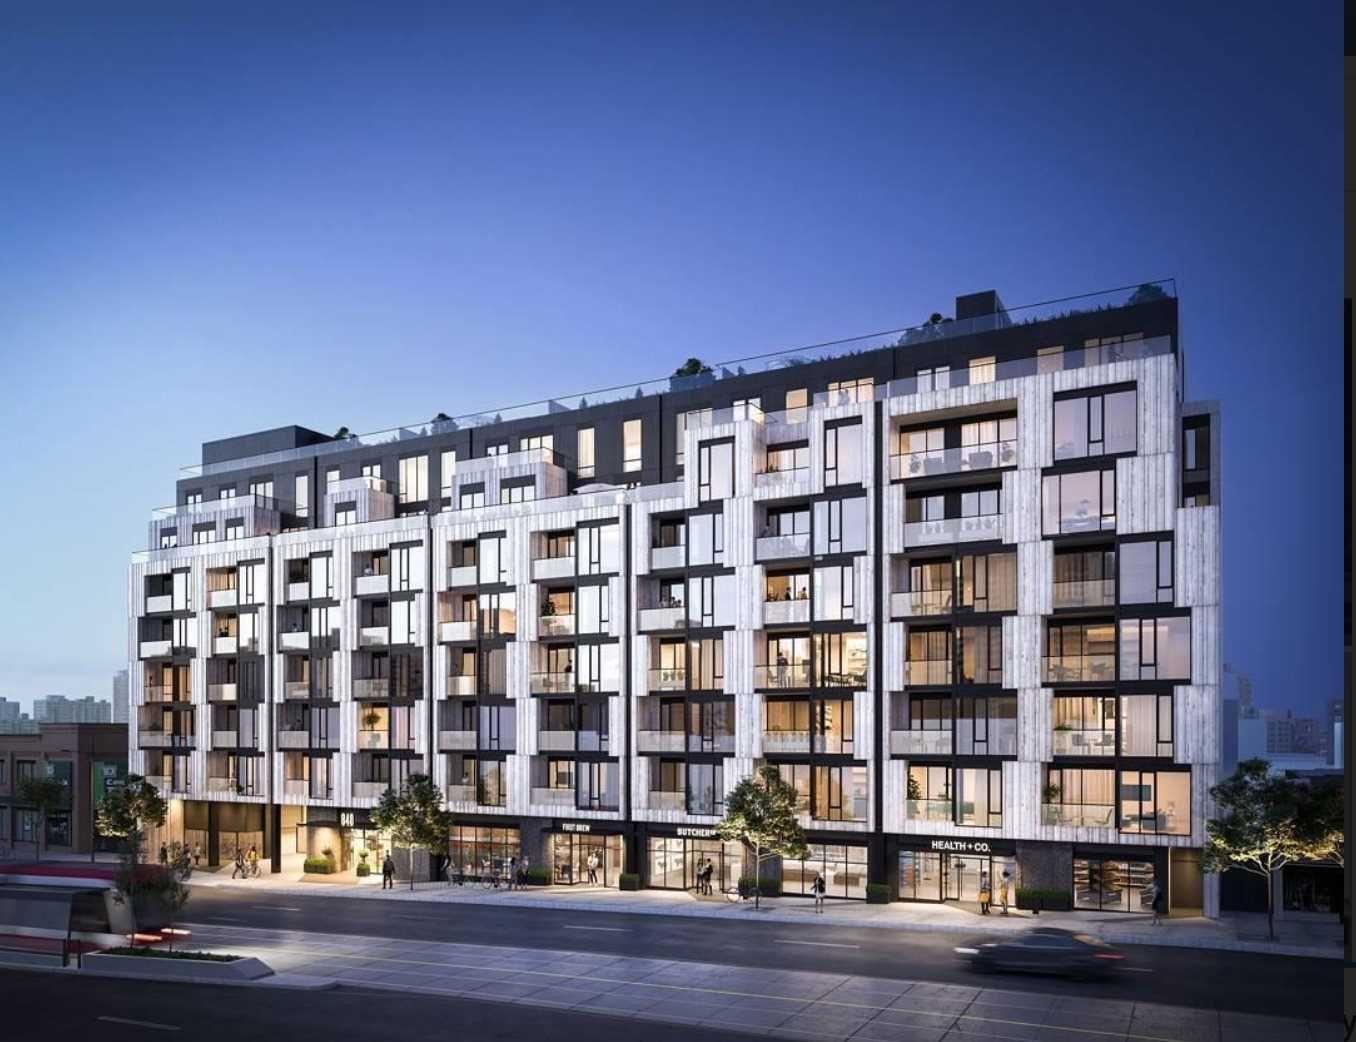 Main Photo: 840 W St Clair Avenue in Toronto: Wychwood Property for lease (Toronto C02)  : MLS®# C5341062